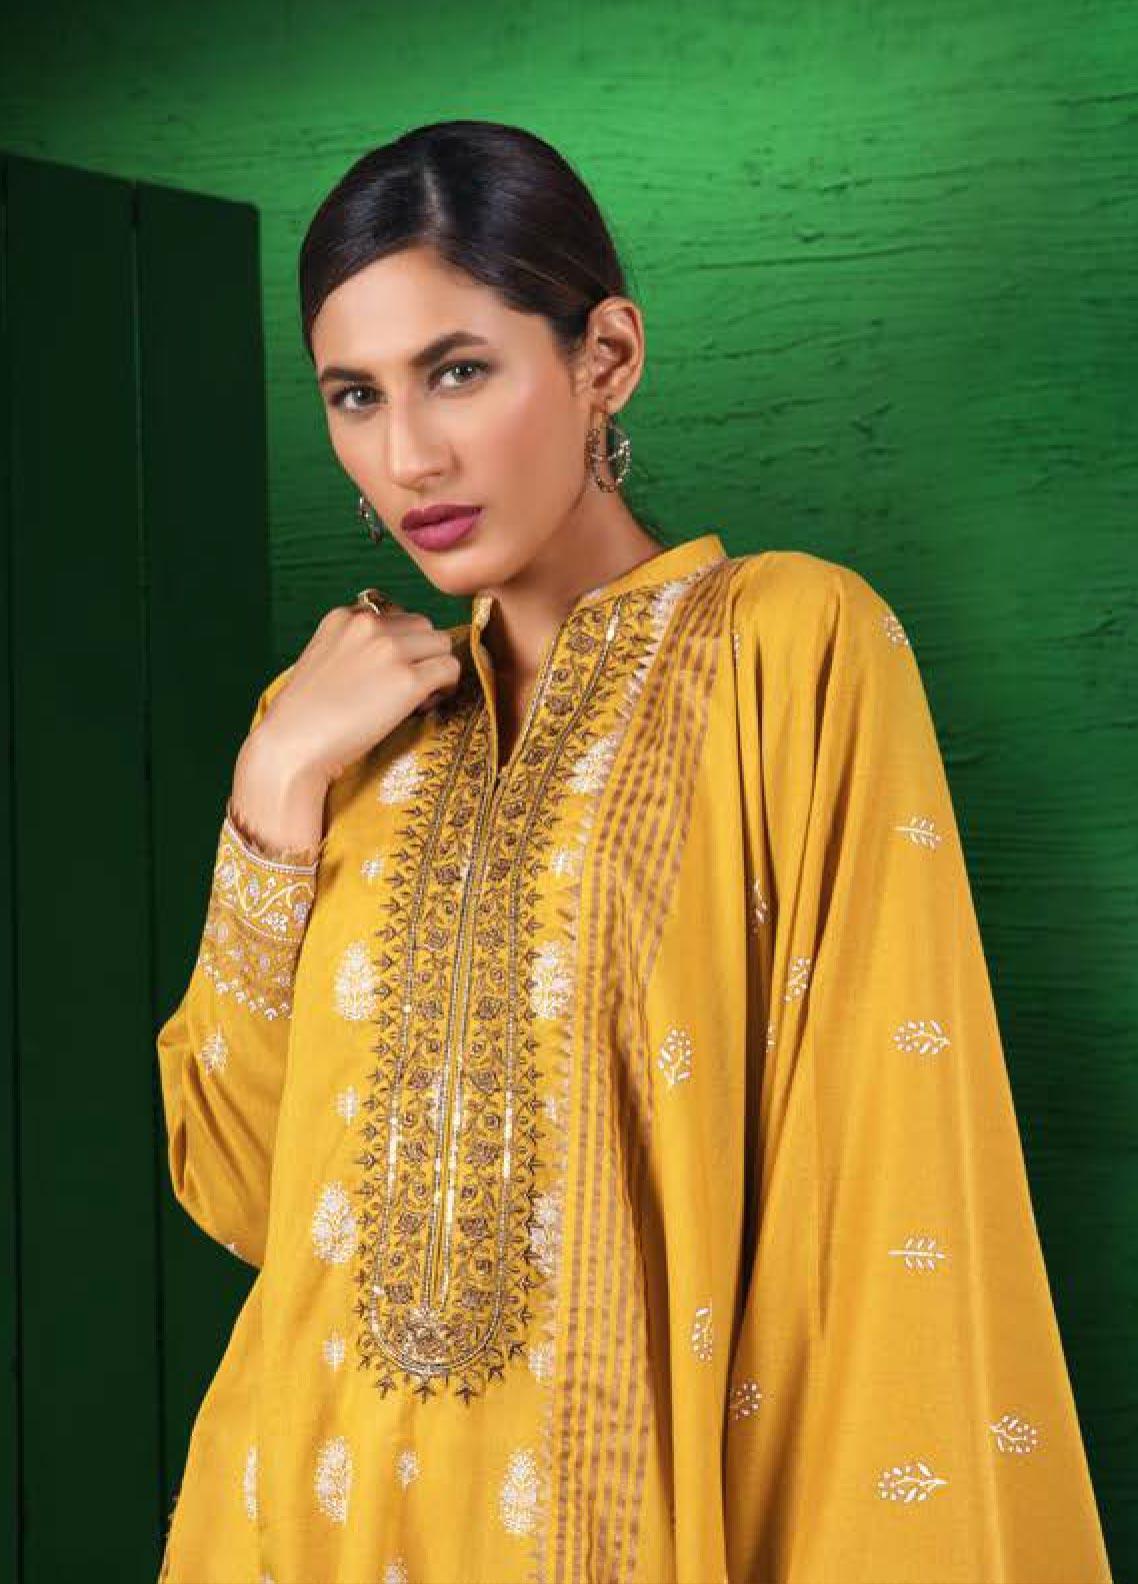 Orient Textile Embroidered Karandi Unstitched 3 Piece Suit OT19W 179 INDIGO A - Winter Collection